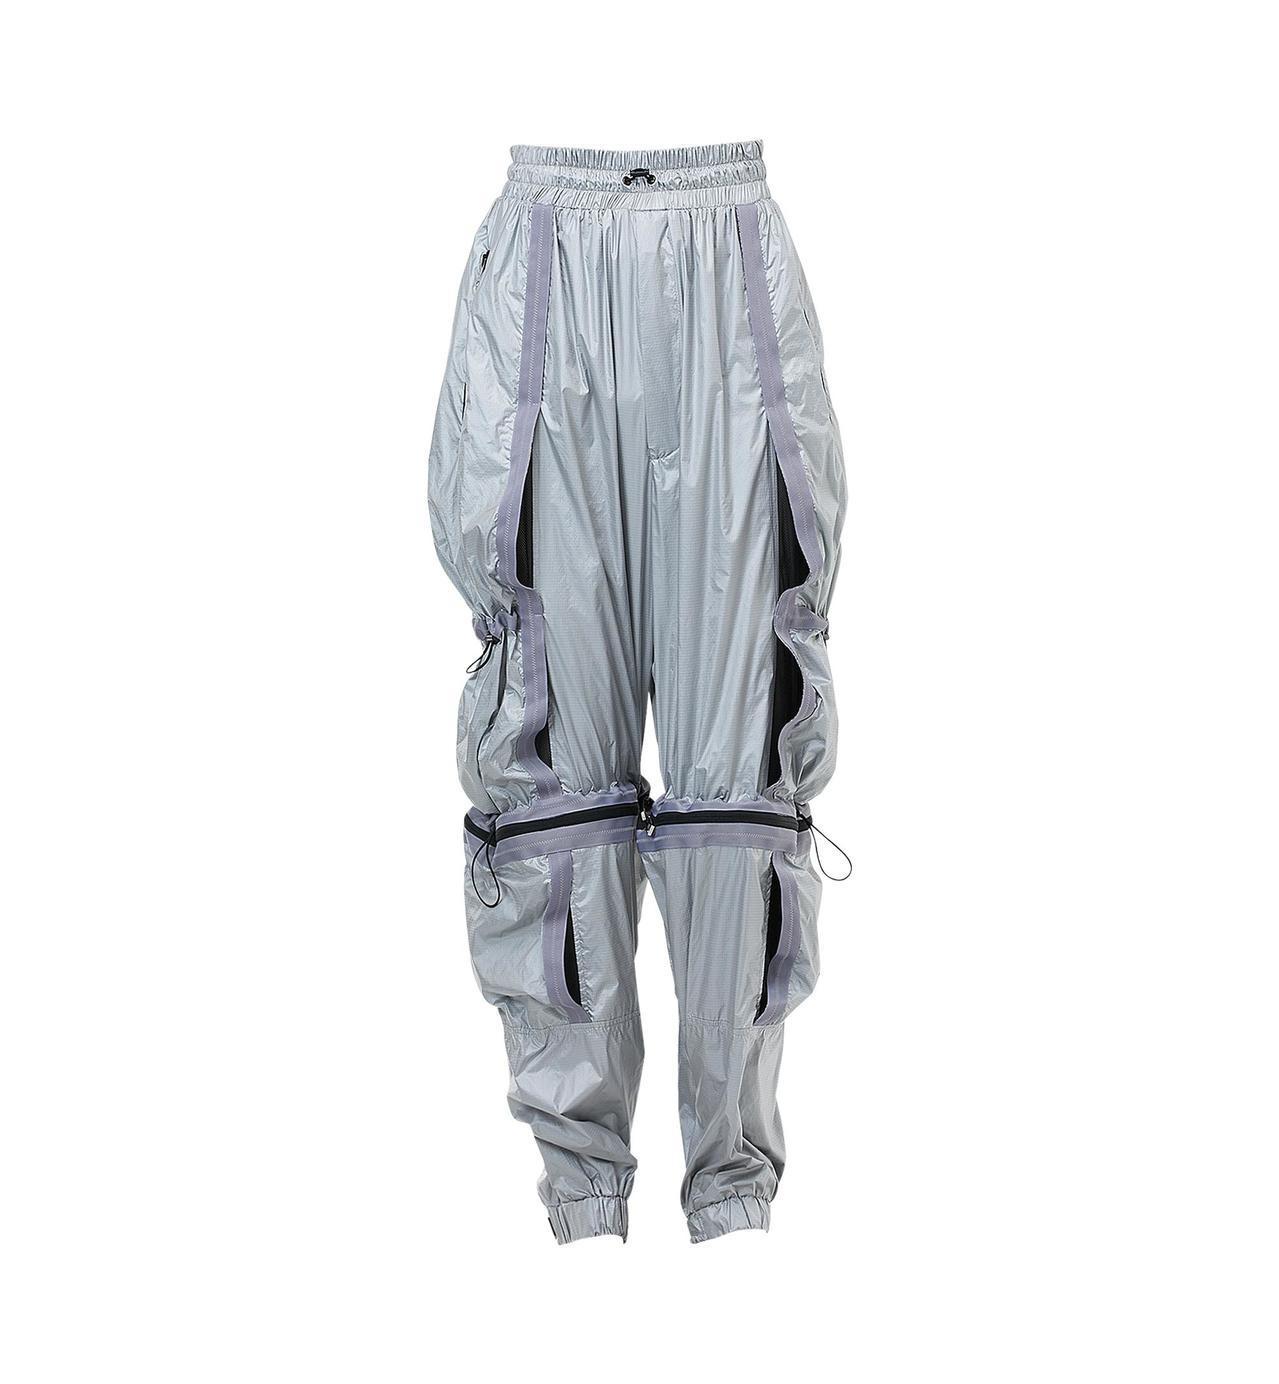 MCM銀色休閒降落傘褲,價格店洽。圖/MCM提供